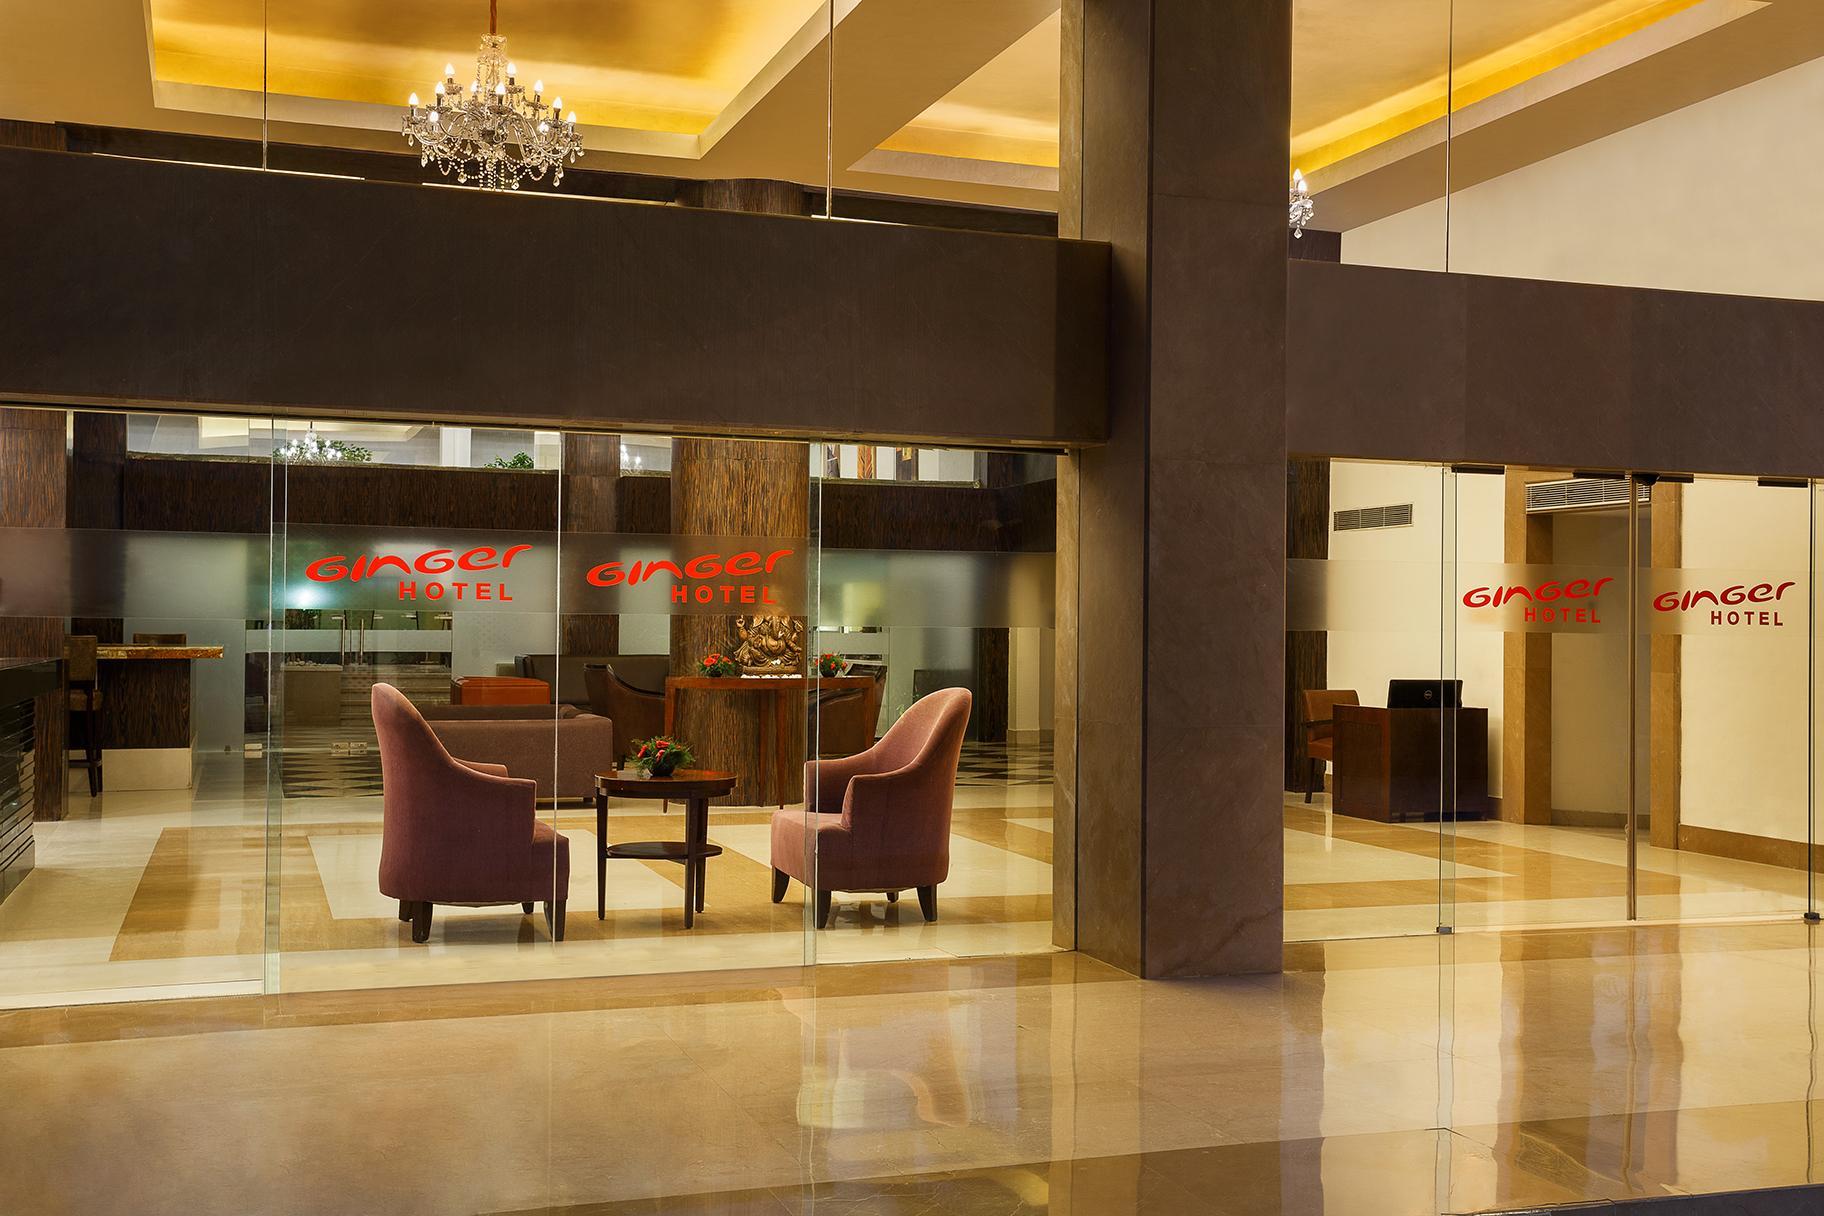 Ginger Hotel Gurgaon Reviews